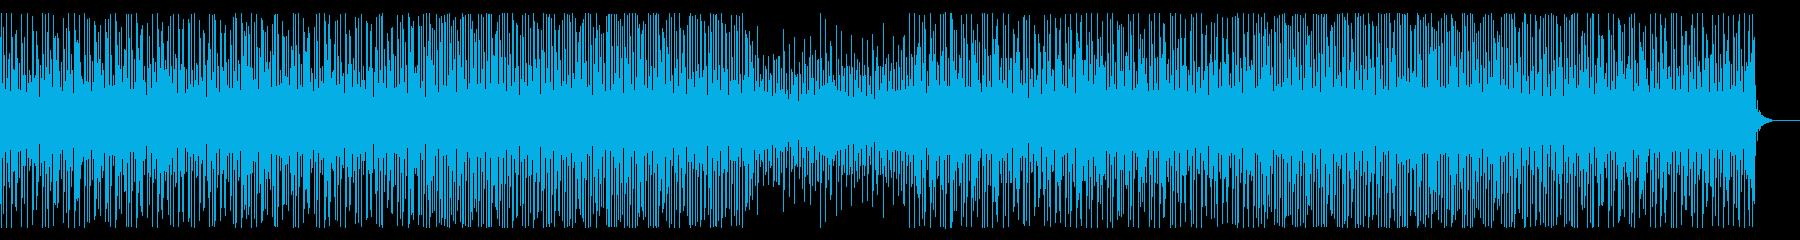 YouTube・トーク・可愛いEDM風!の再生済みの波形